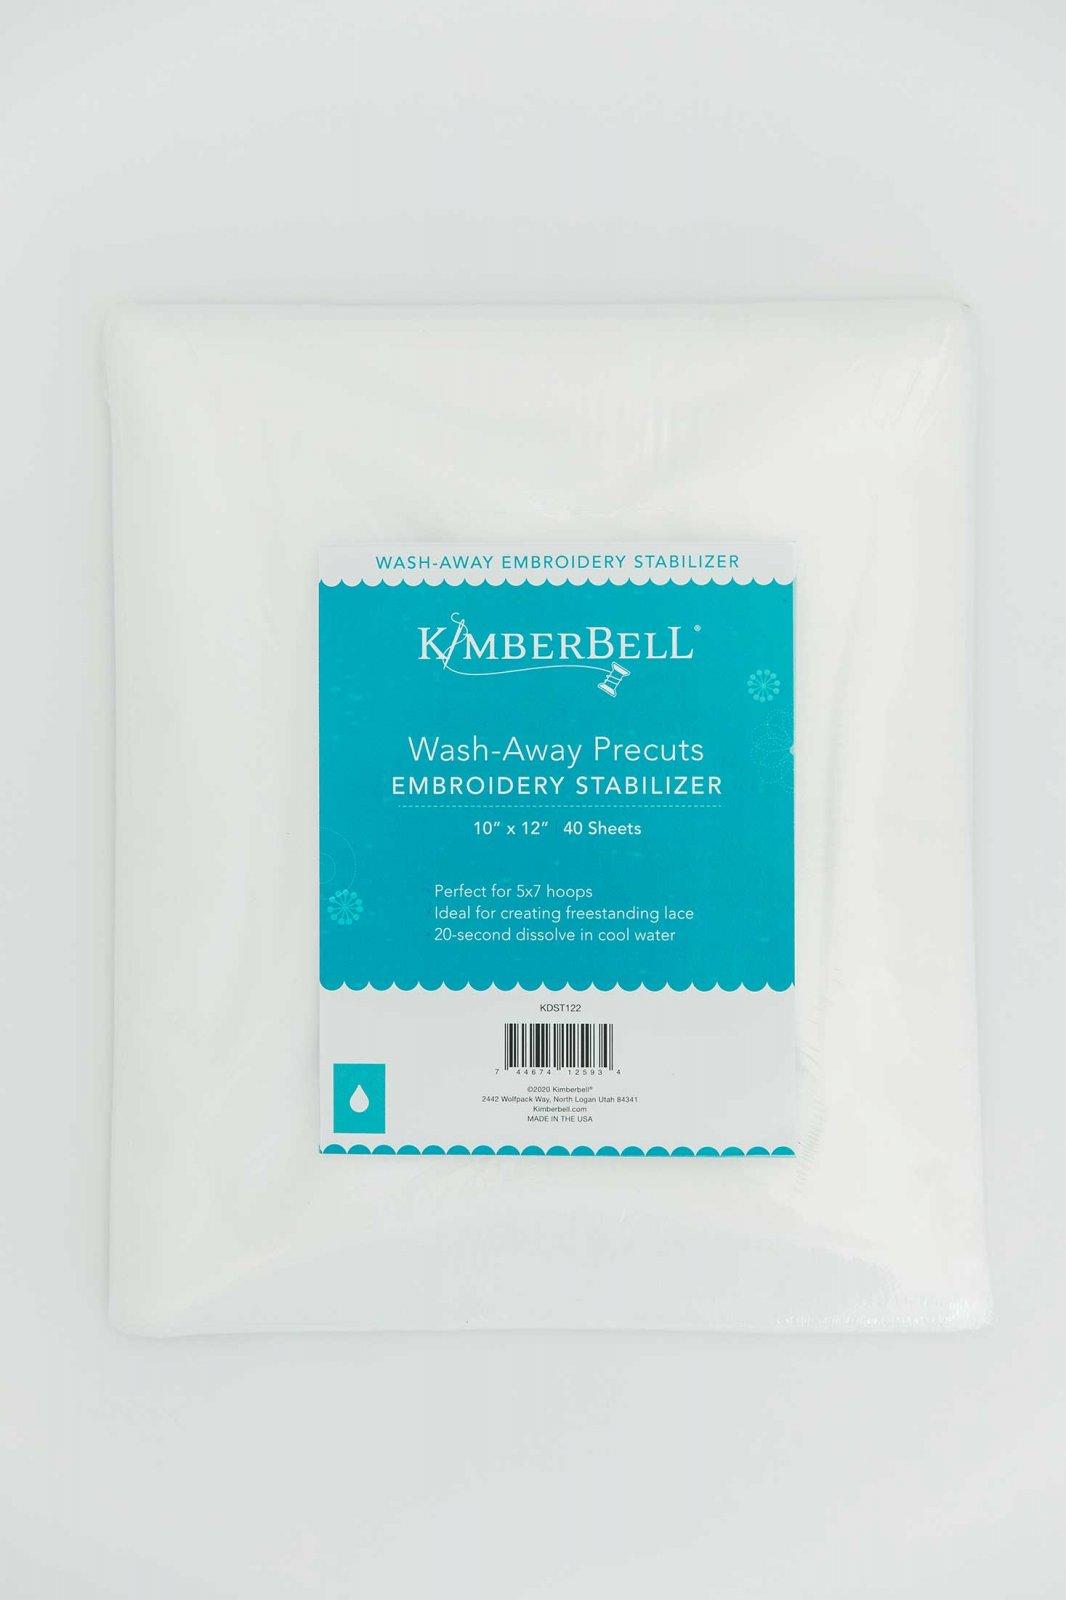 Kimberbell Stabilizer -  Wash-Away Precuts 10 x 12 40 Sheets